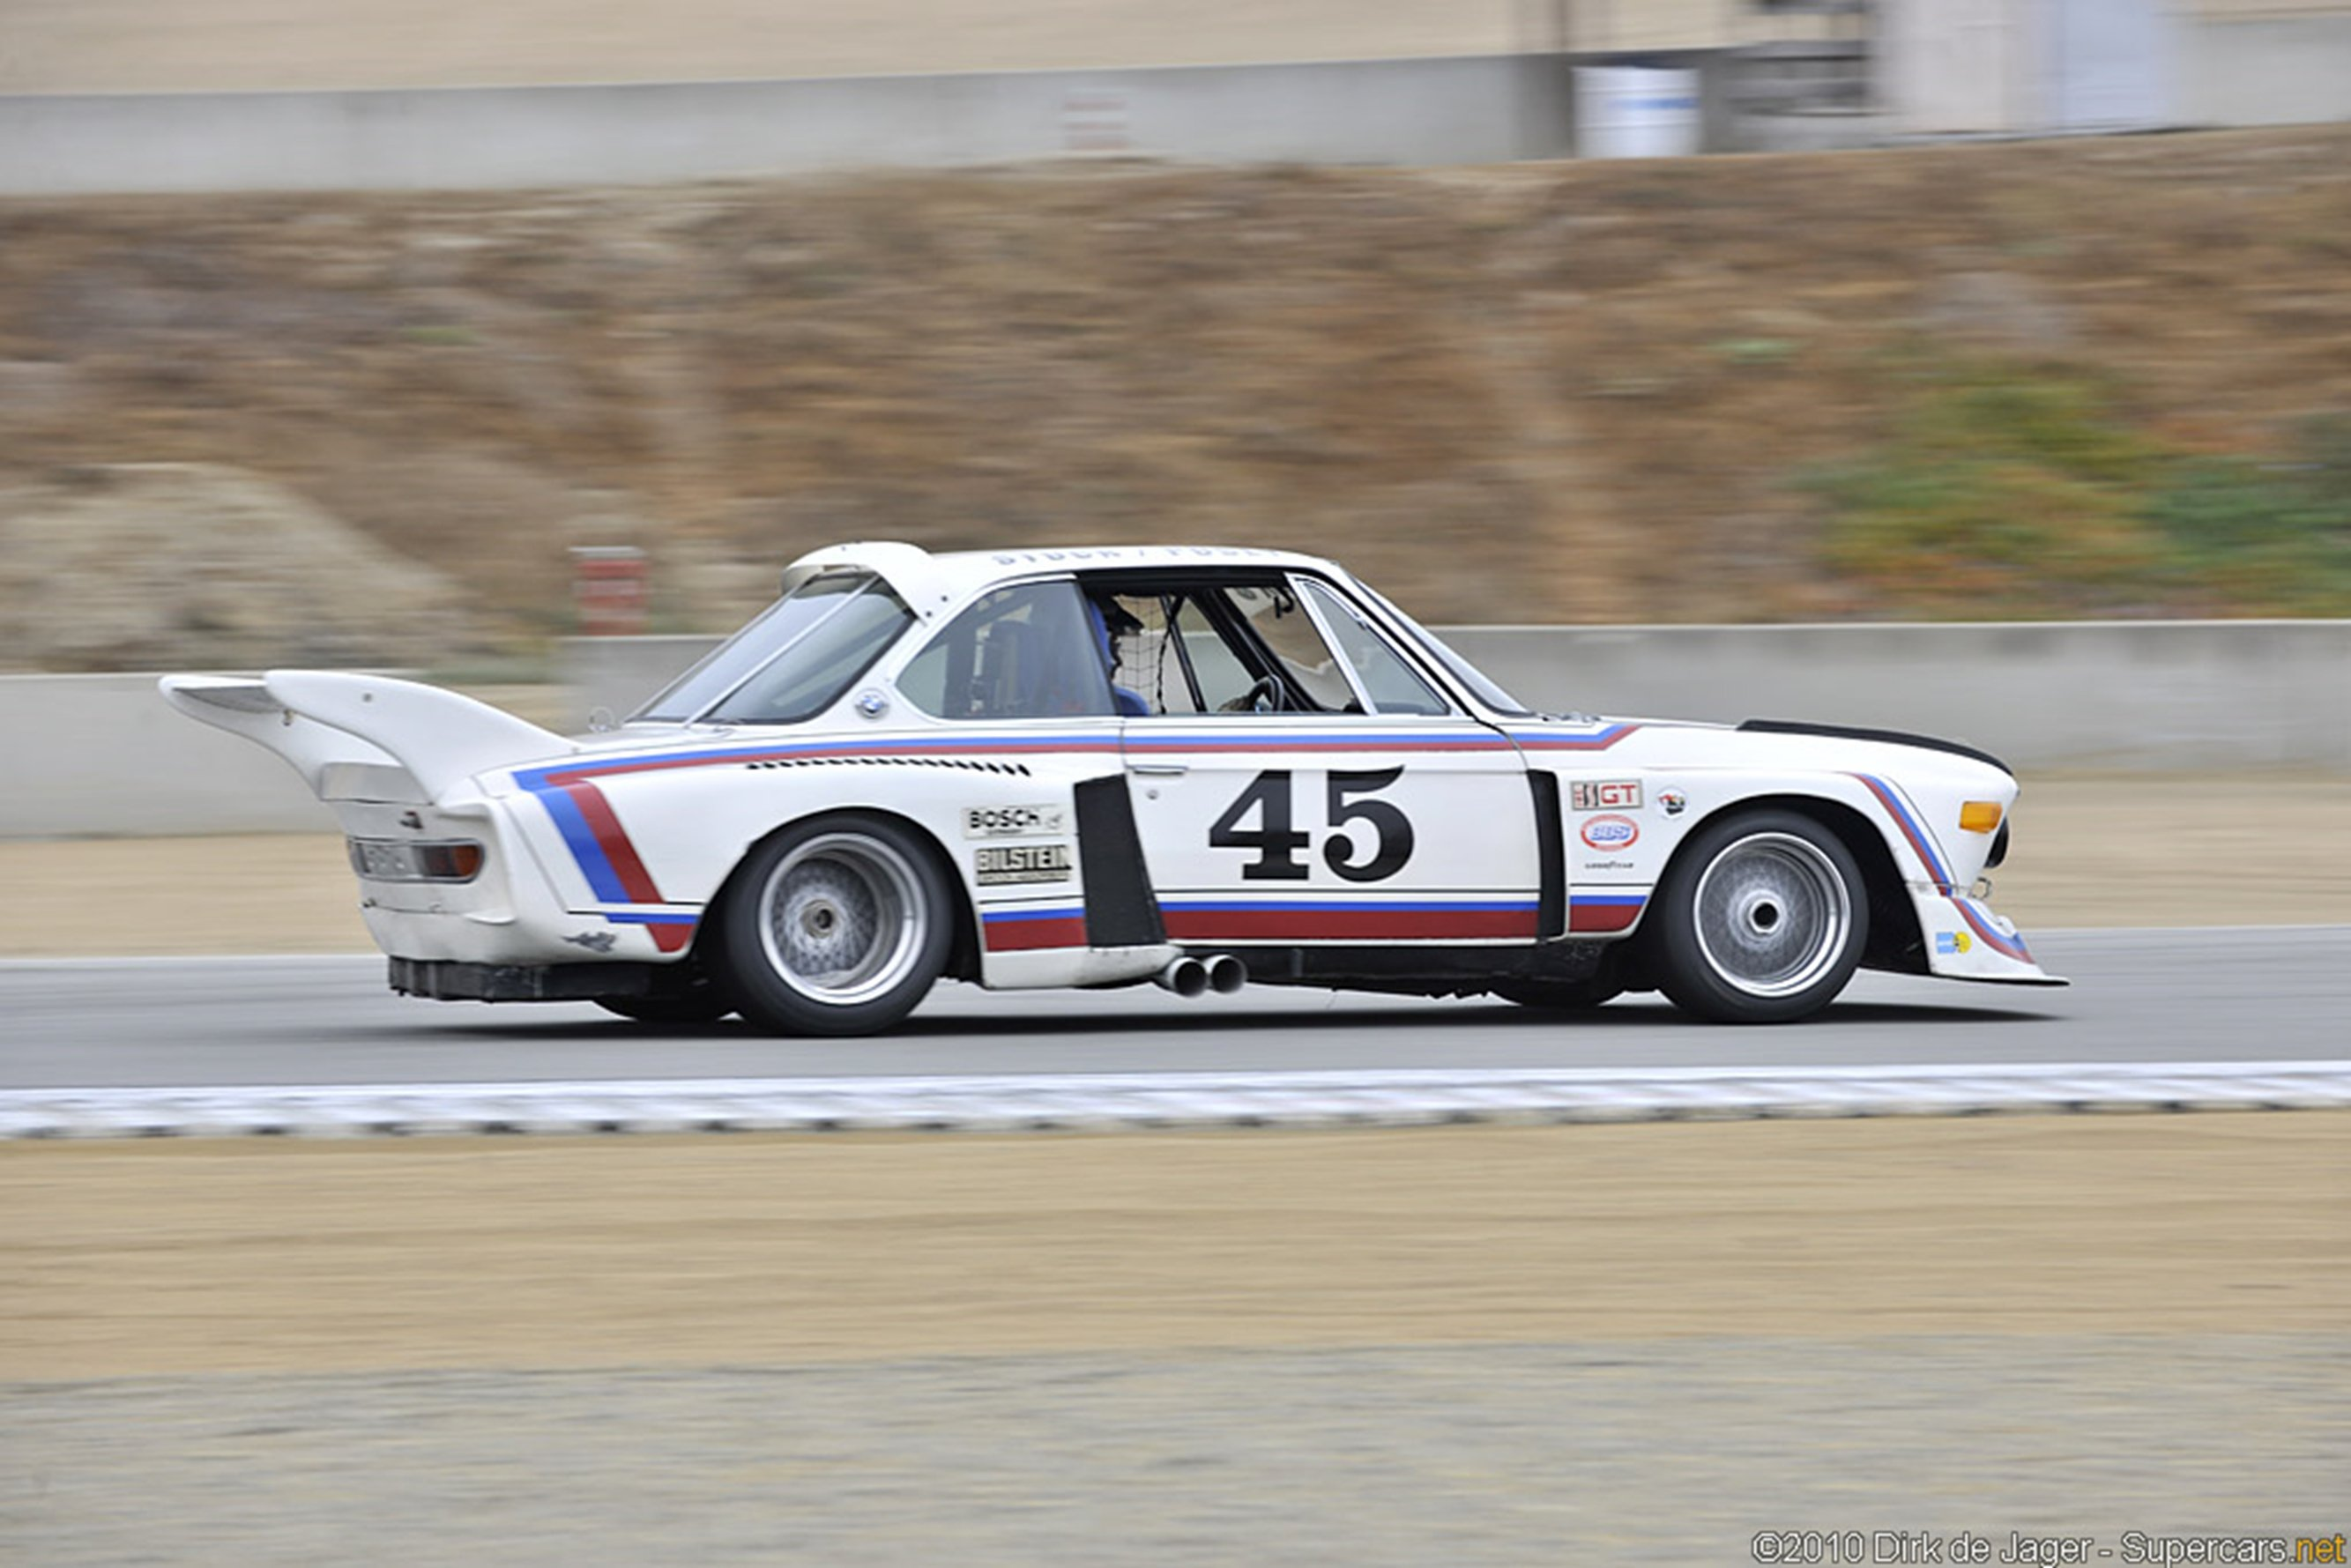 race car racing classic bmw wallpaper 2667x1779 343231